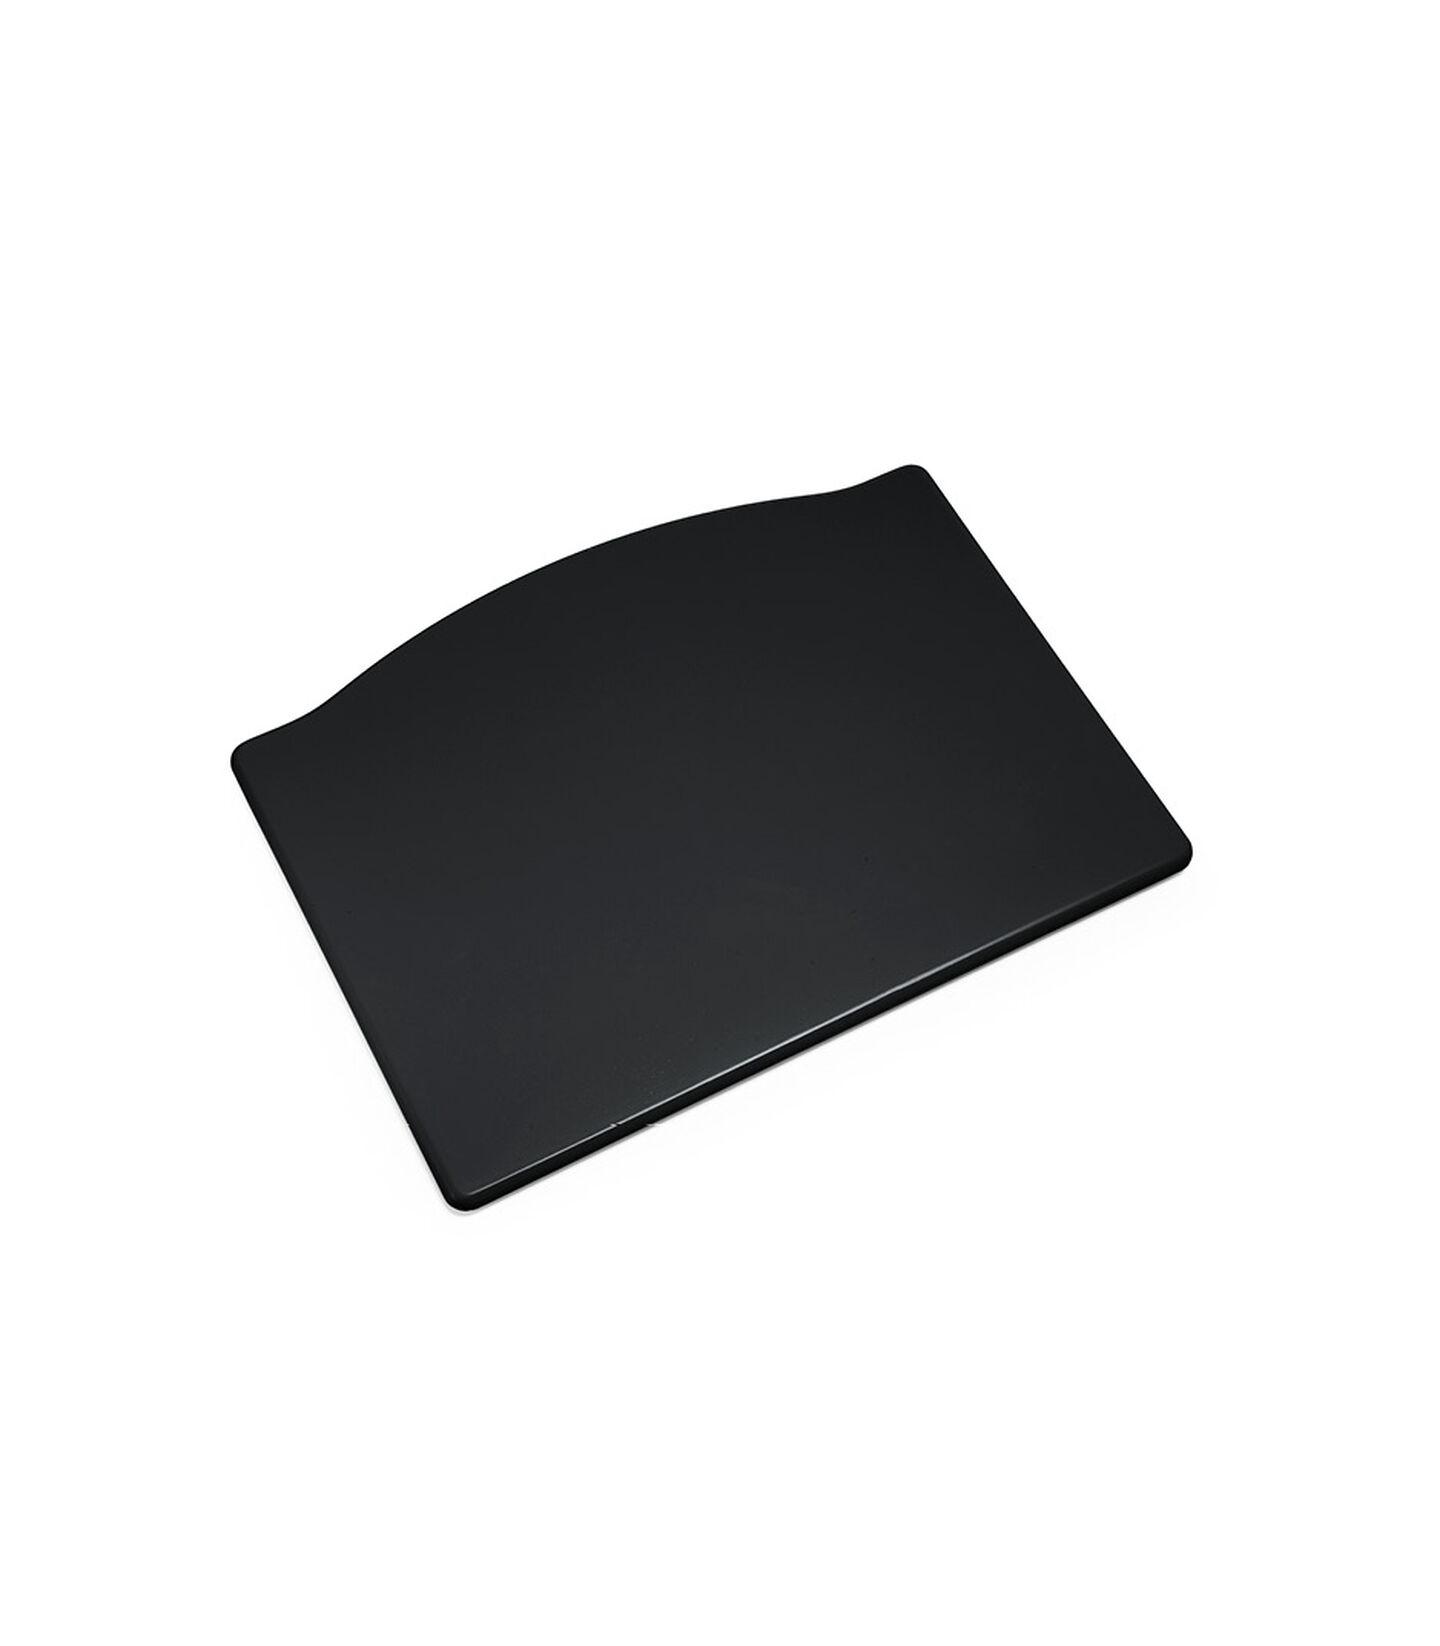 Tripp Trapp® Fotplate Black, Black, mainview view 1